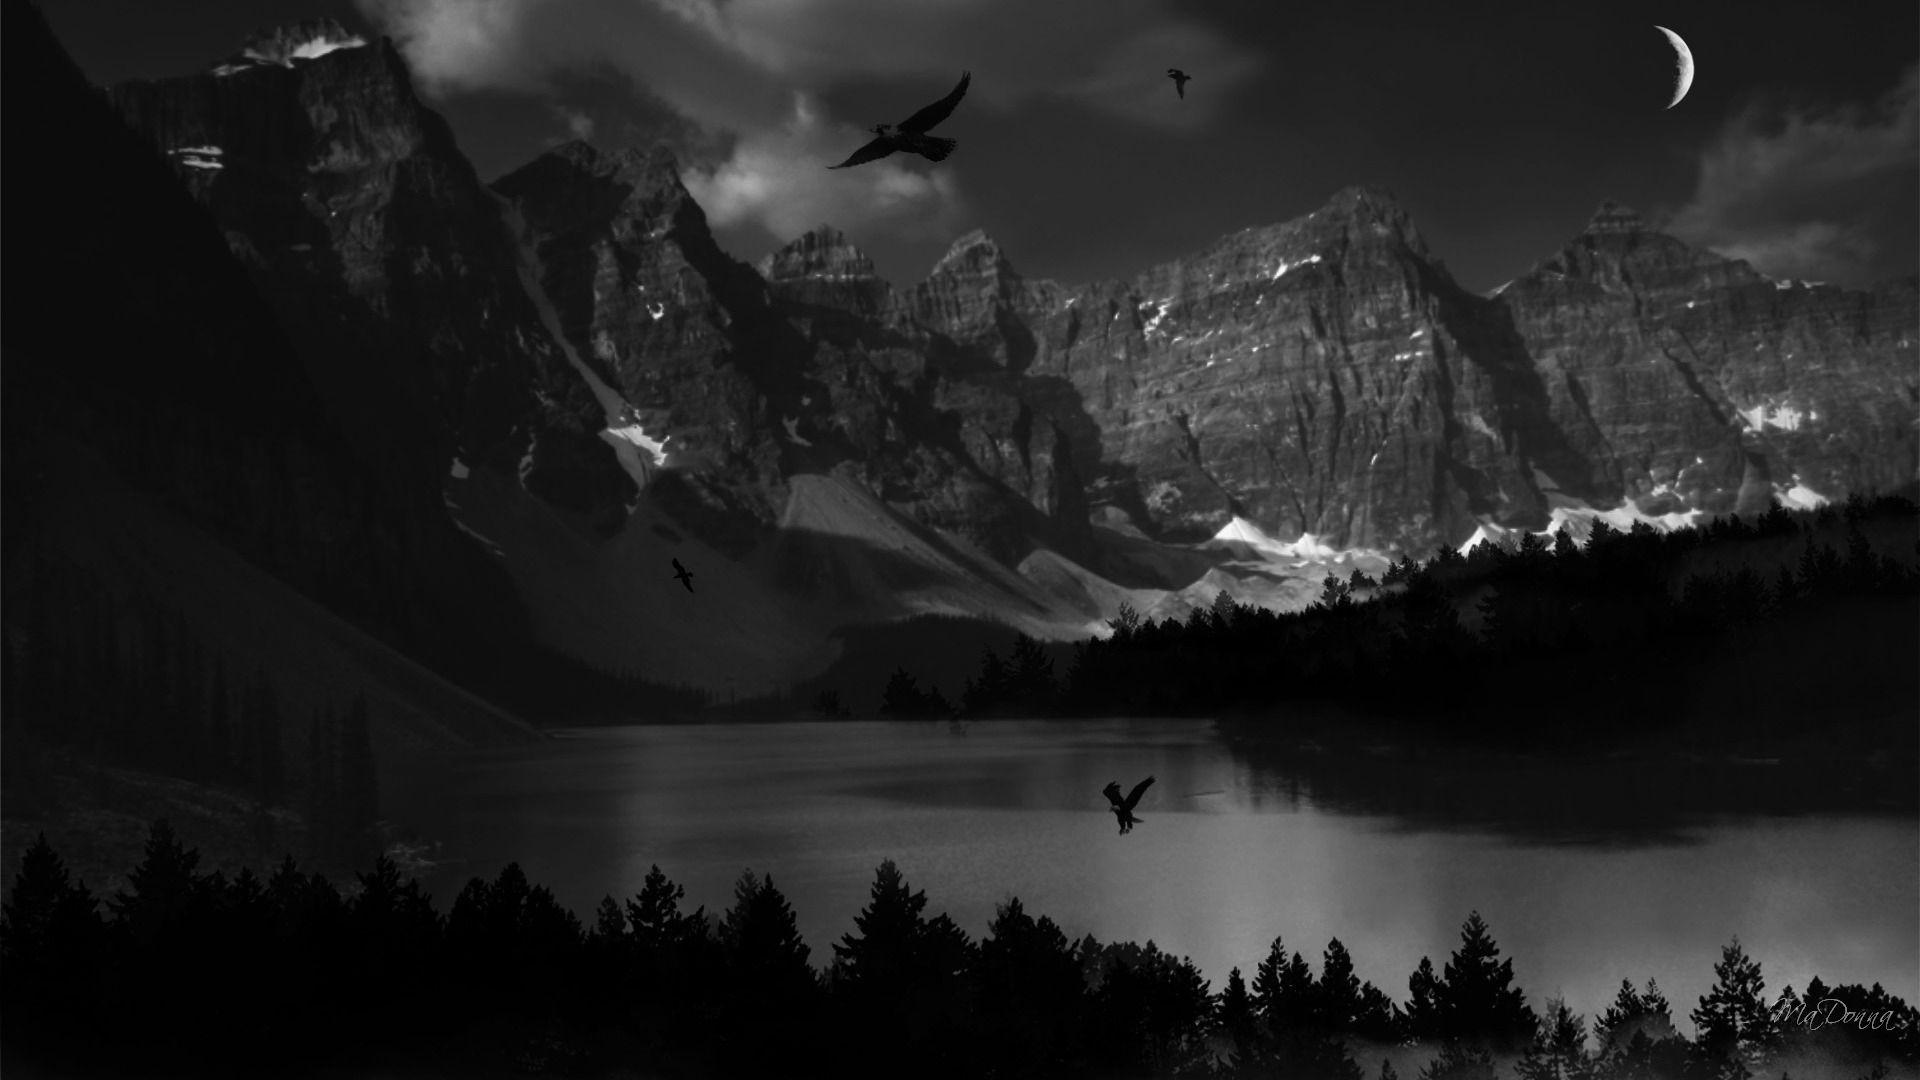 Pin by Adam Vincent Lanegan on Darkness in a different light in 2019 | Dark wallpaper, Dark ...